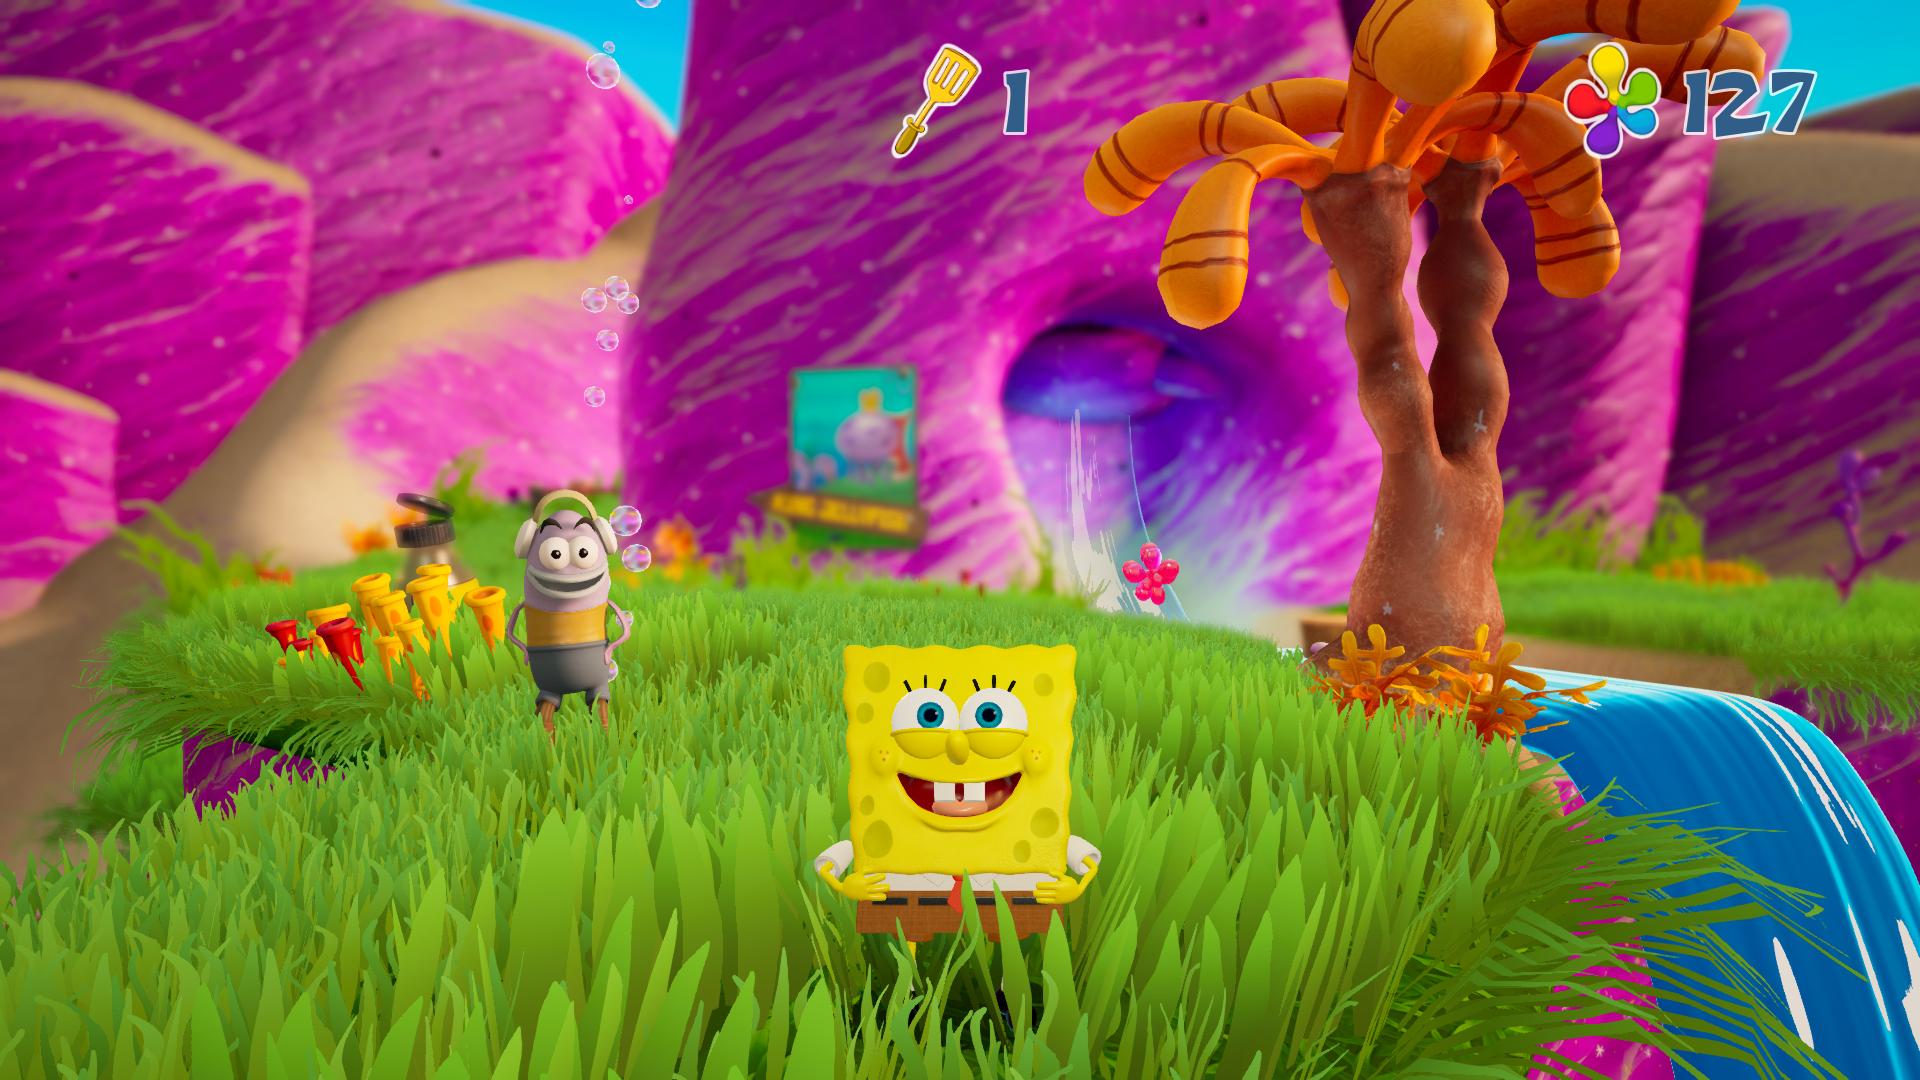 Spongebob's Dream Hub